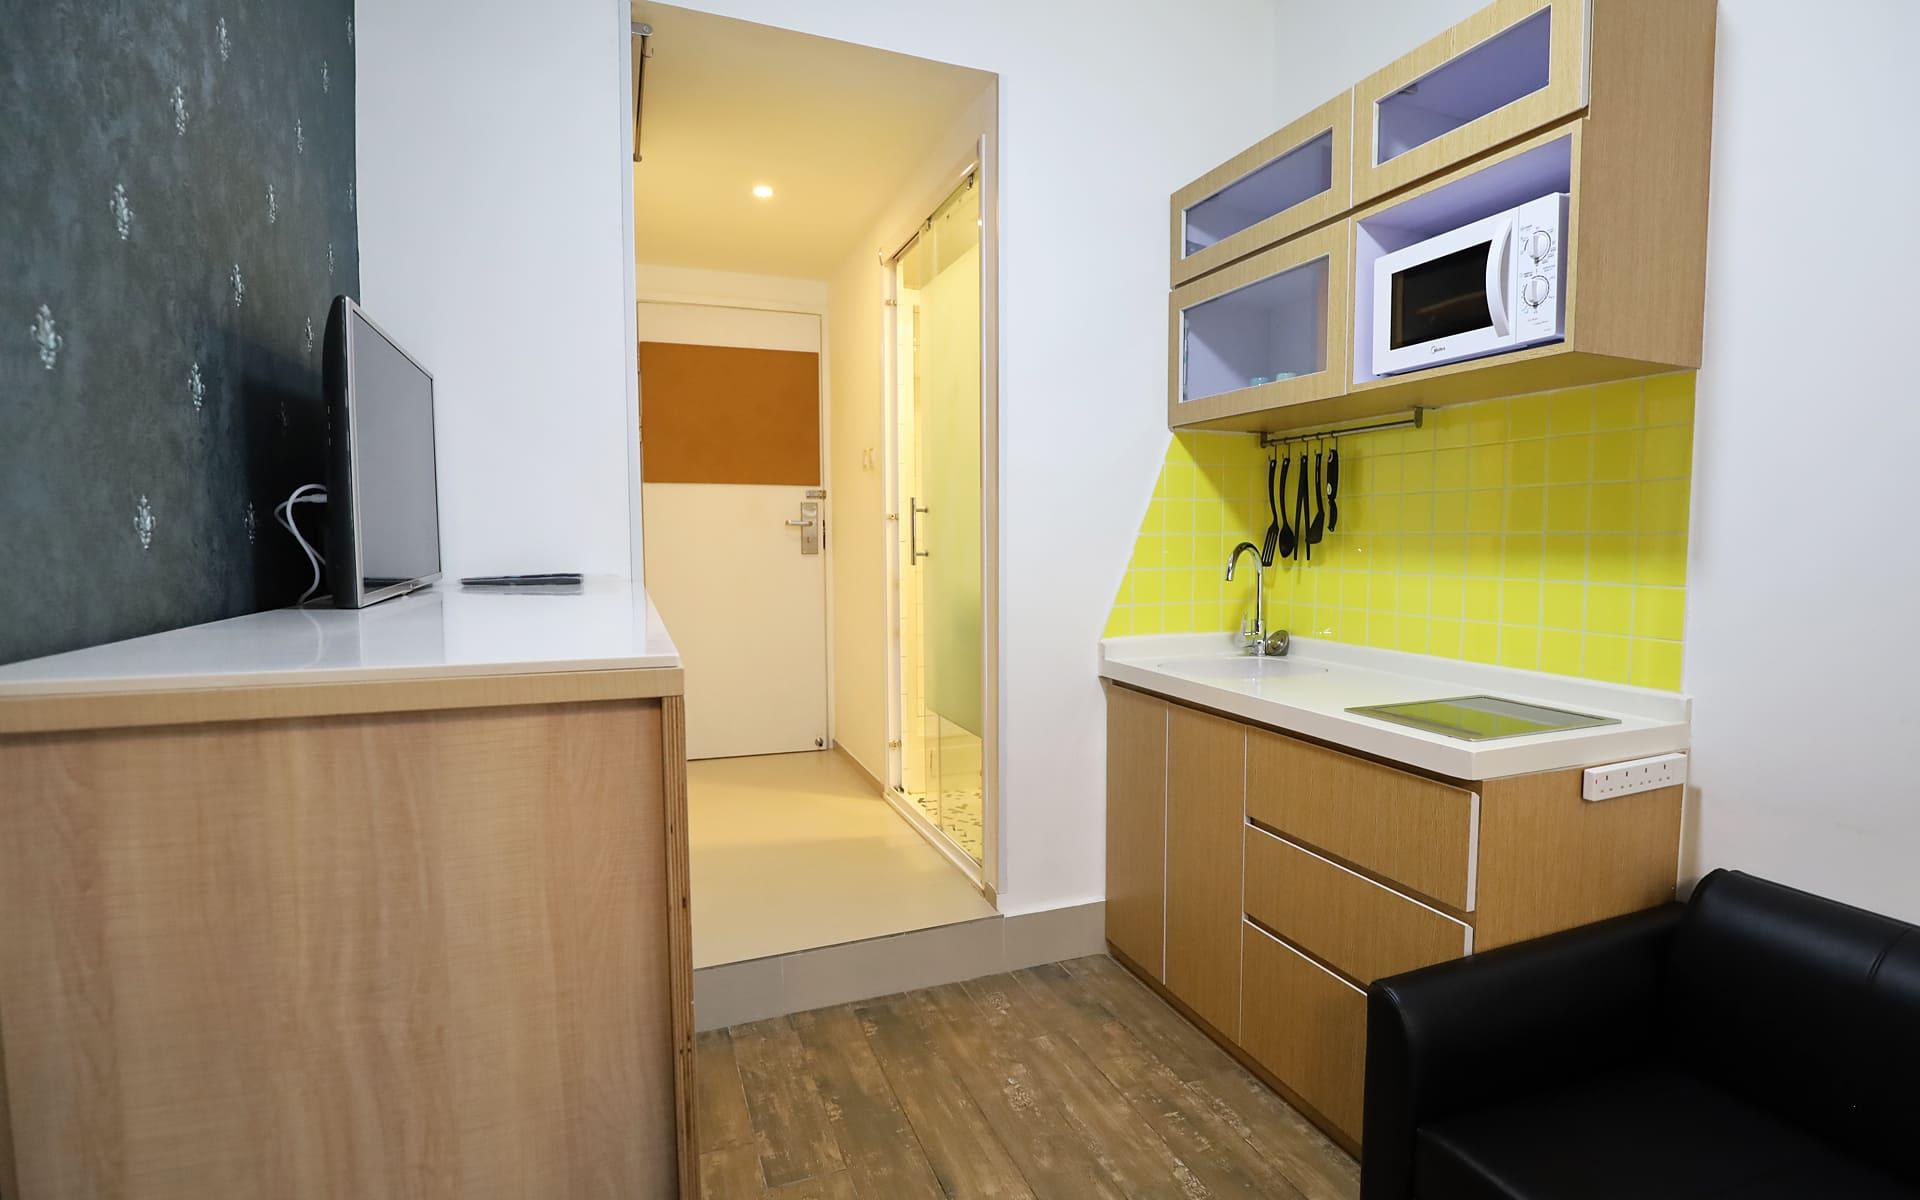 hk_service_apartment_10196780521583918485.jpg